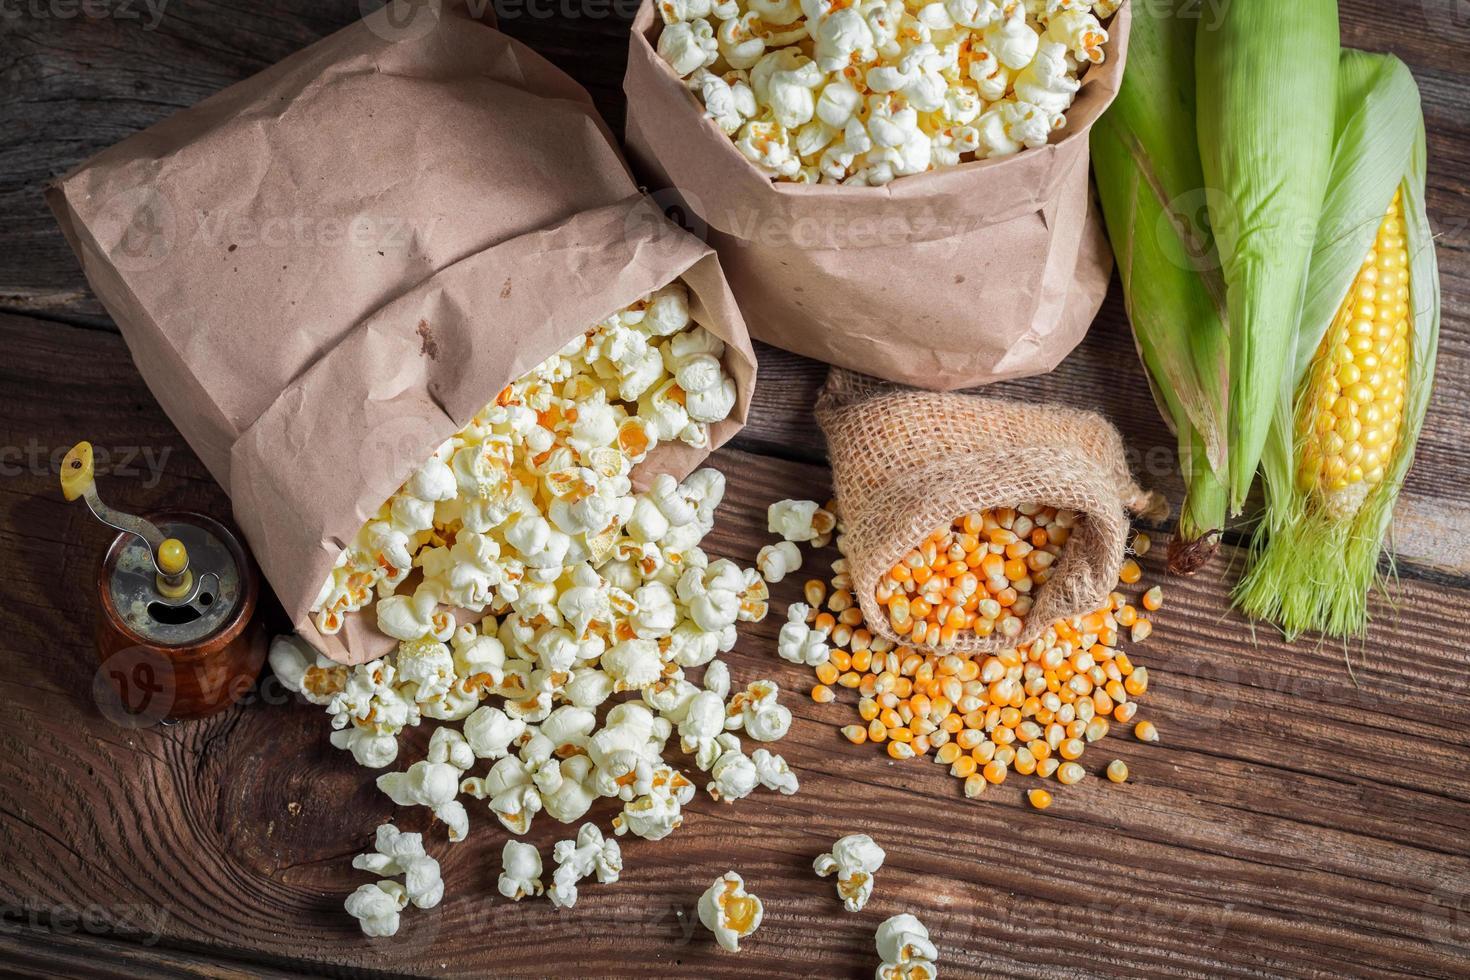 Corn and popcorn in rustic version photo